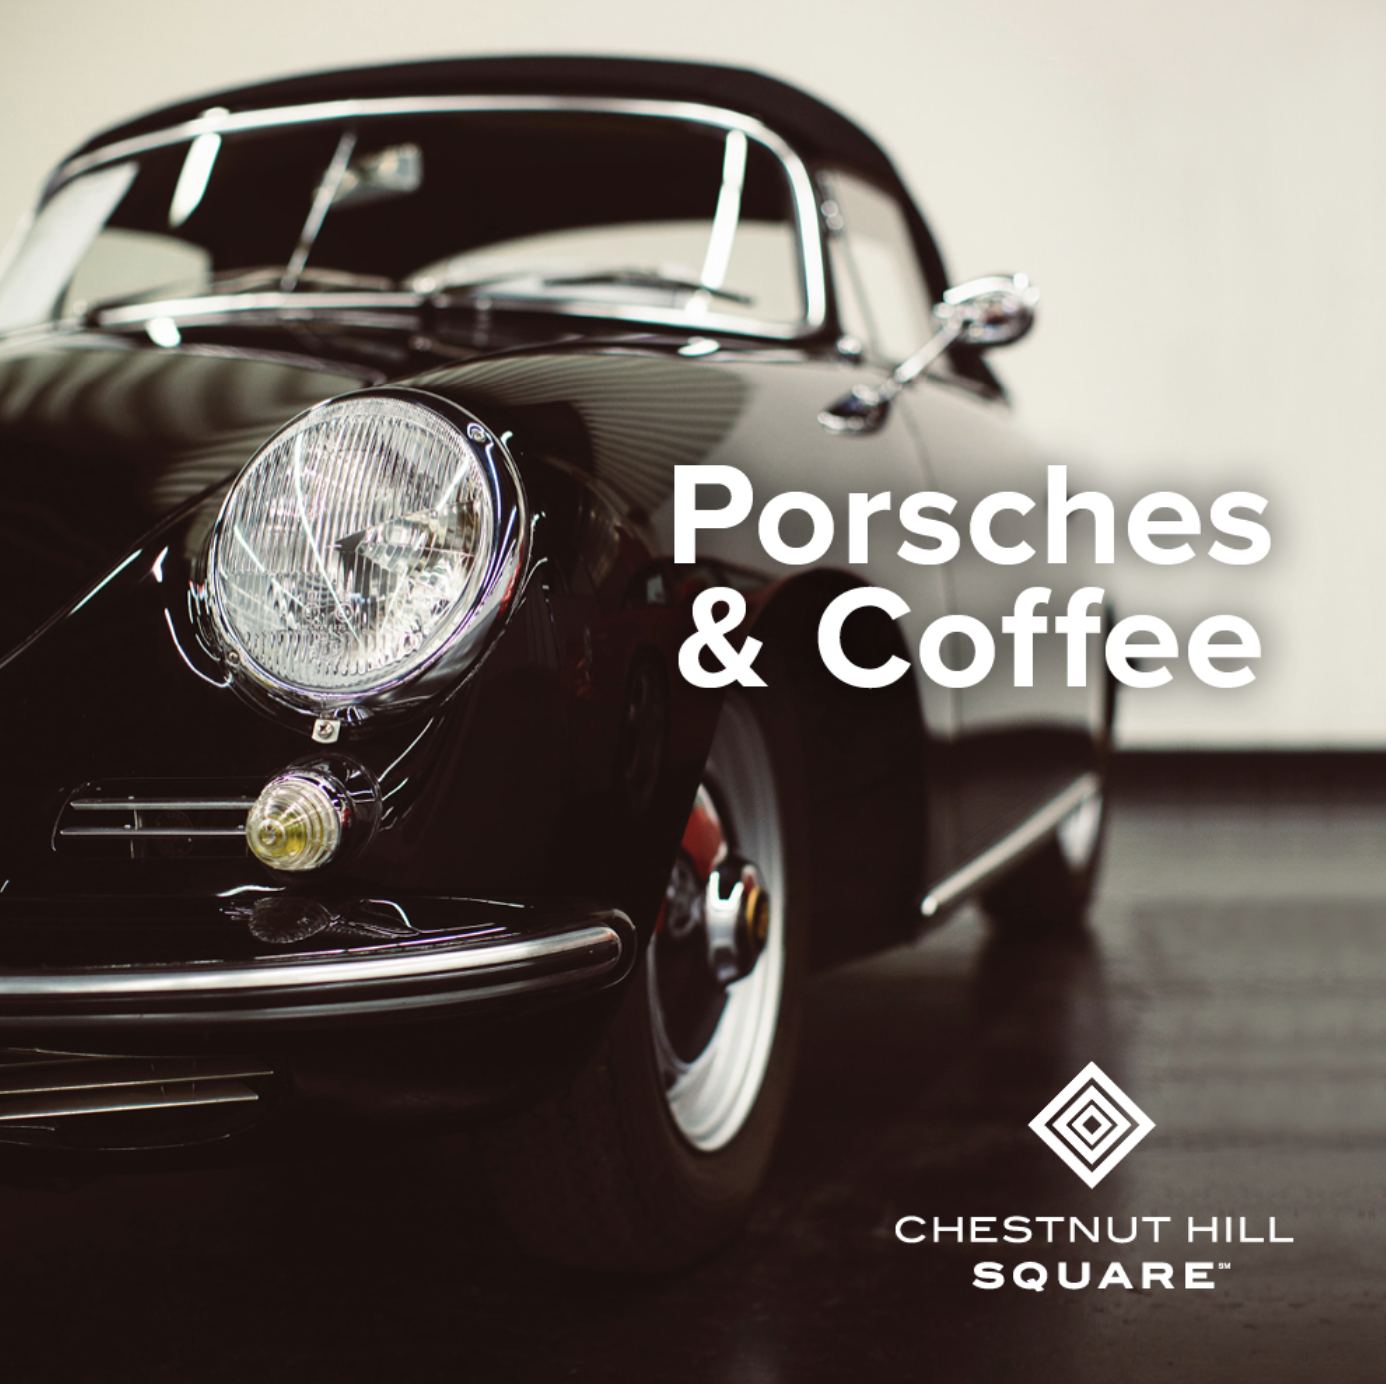 Porsches and Coffee